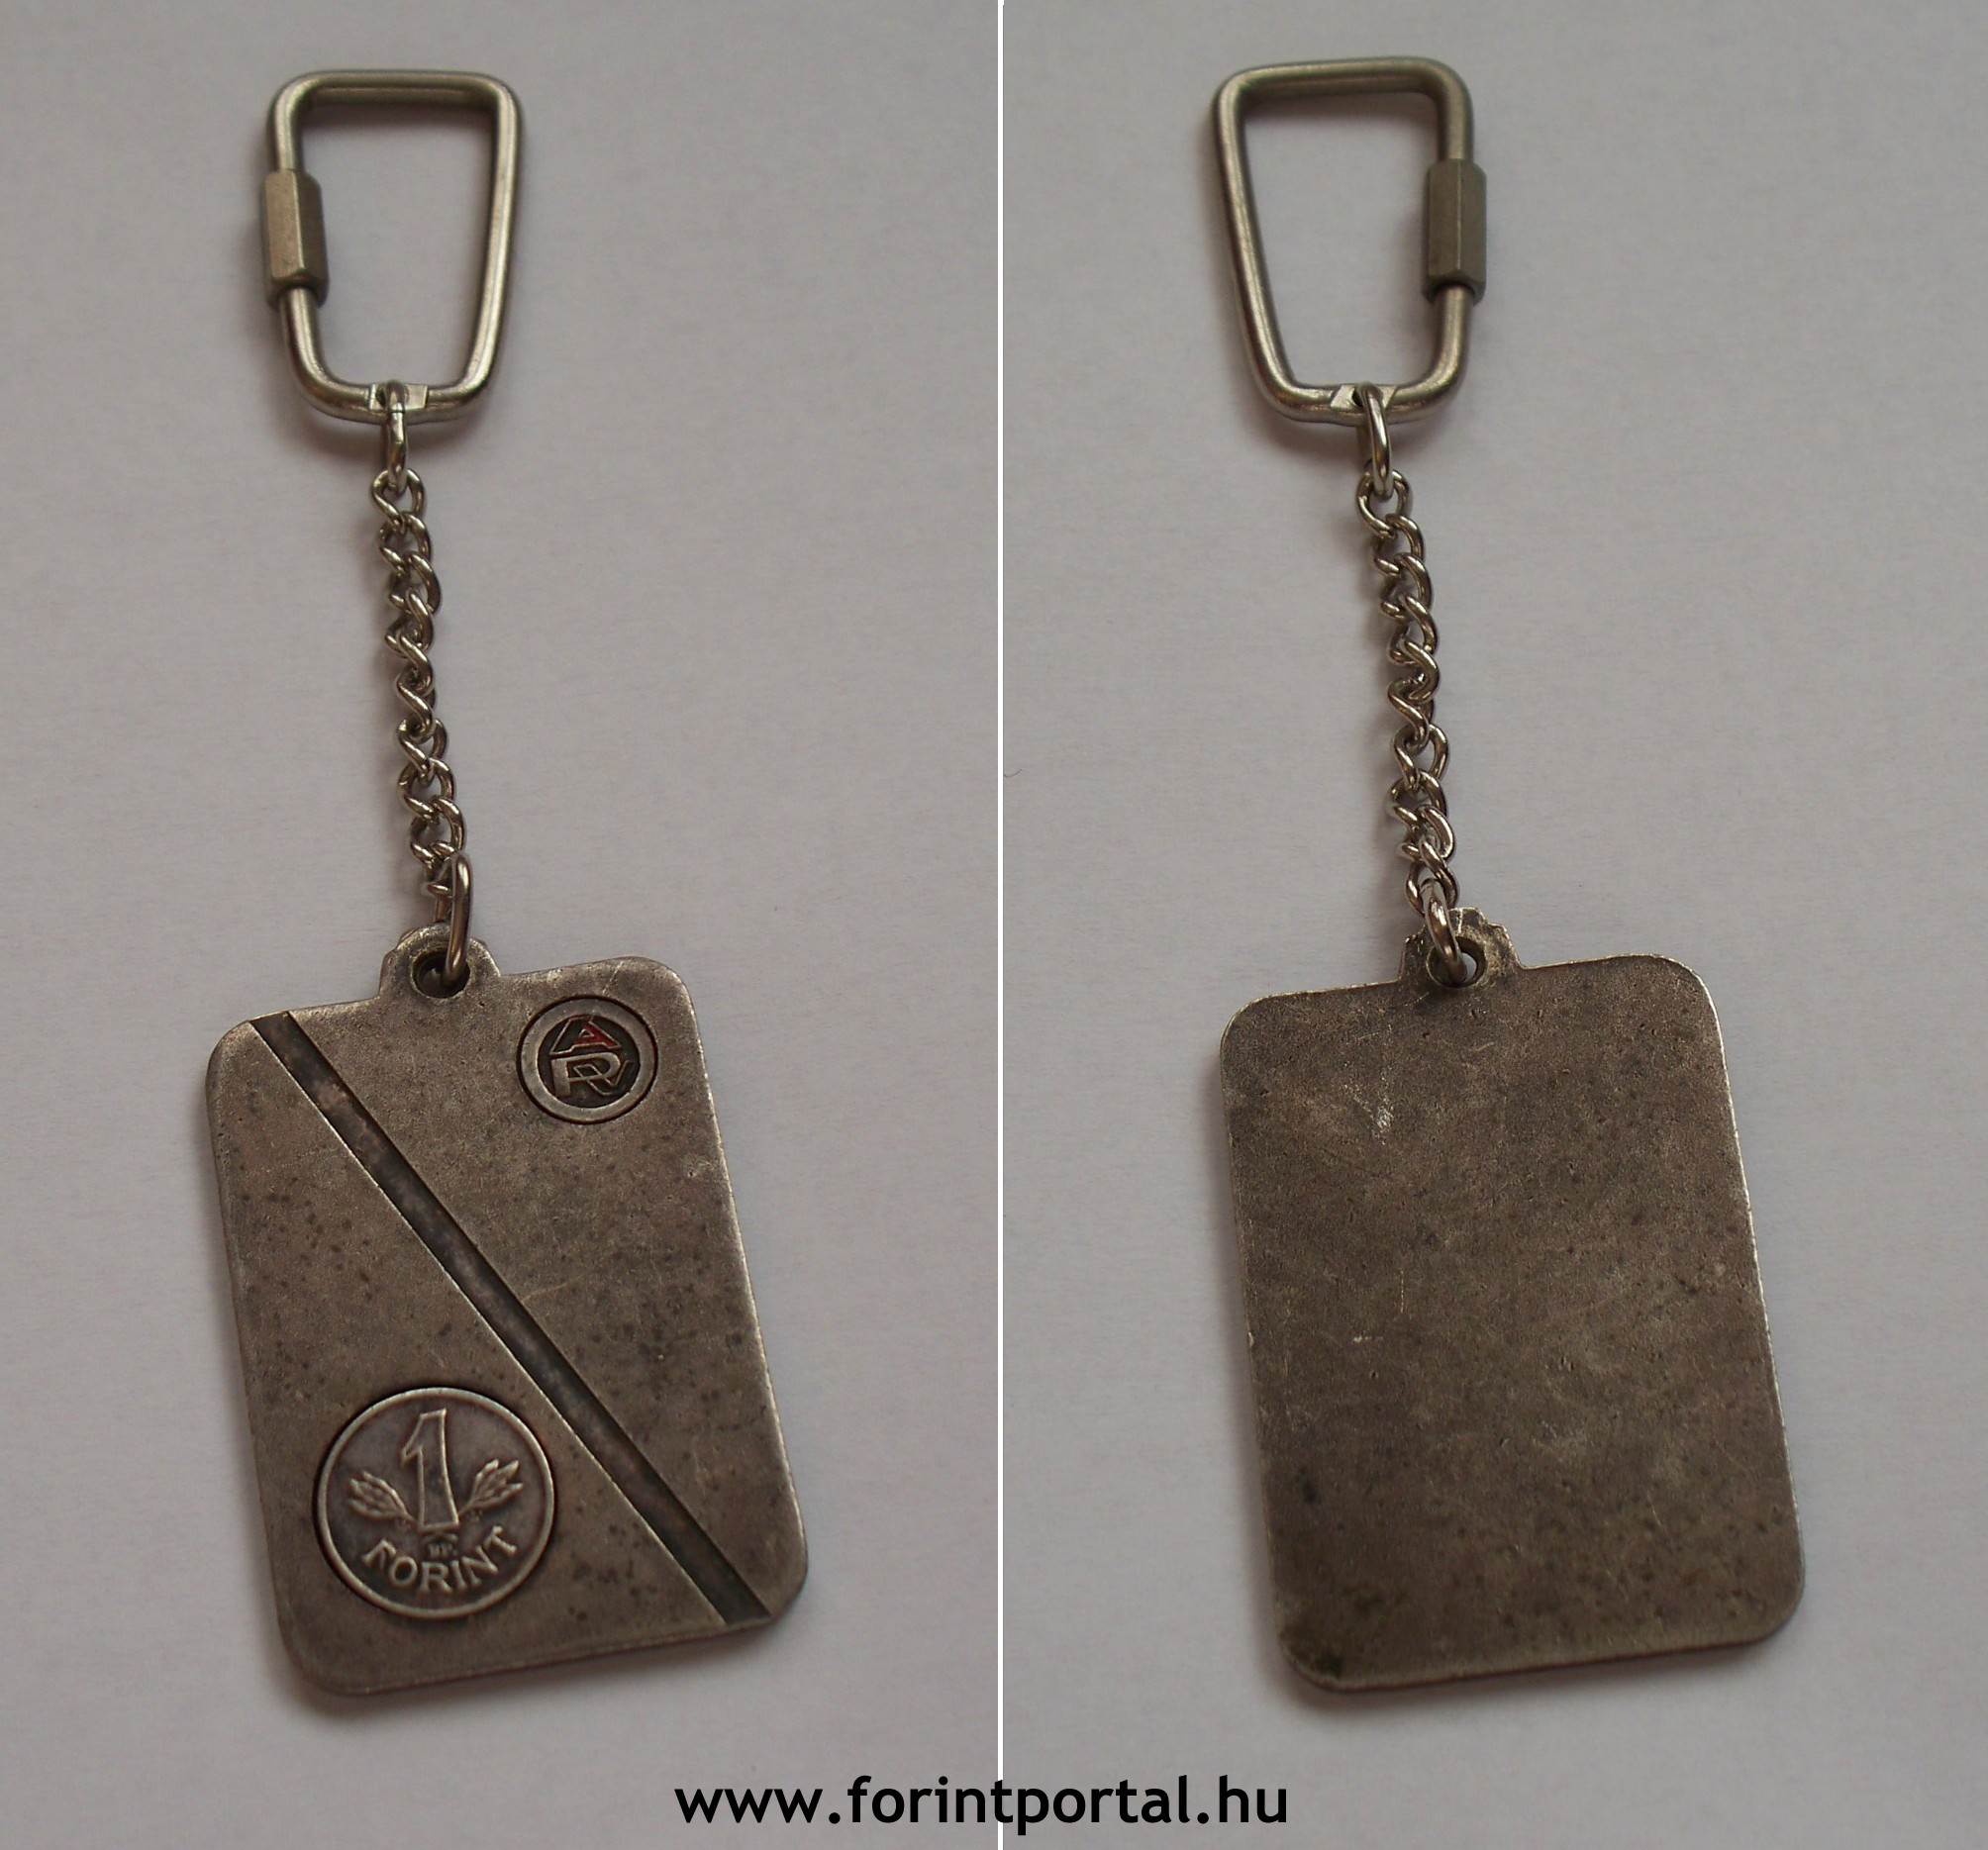 http://www.forintportal.hu/hirek/mini-1-forintos-kulcstartok/mini-1-forintos-kulcstartok-apv-allami-penzvero-nikkel-1ft.jpg